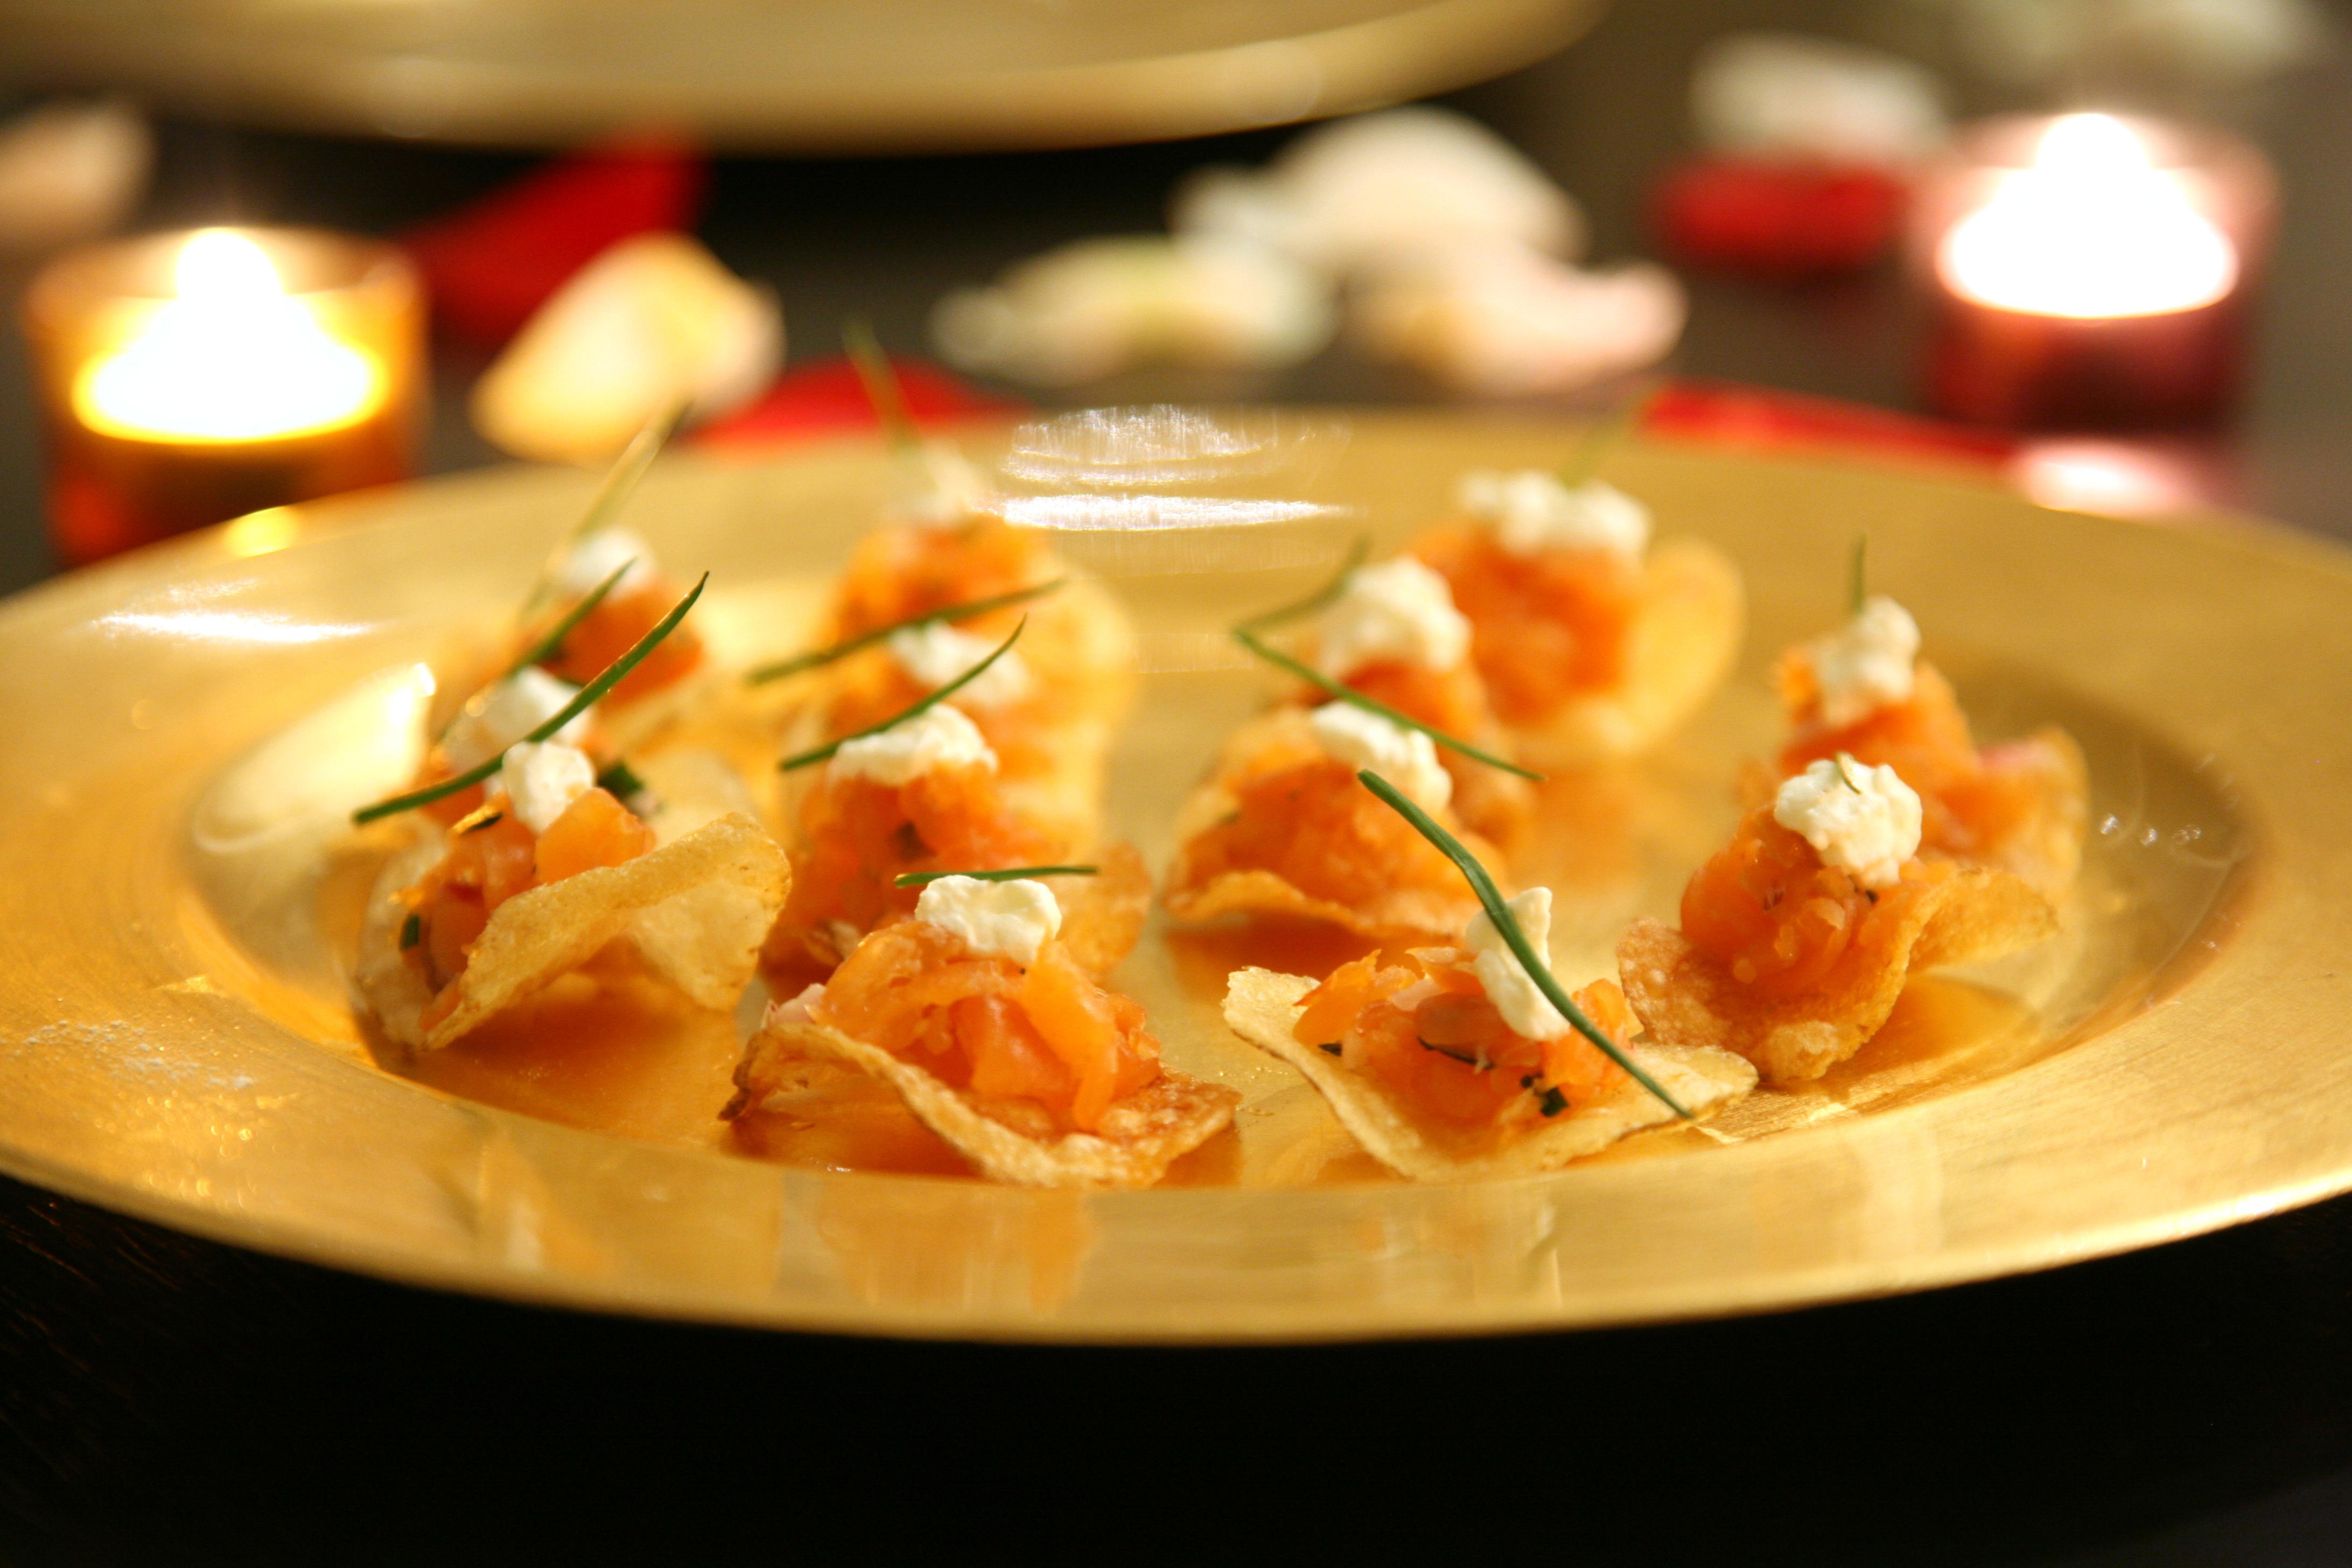 Smoked salmon canapes | Flickr - Photo Sharing!